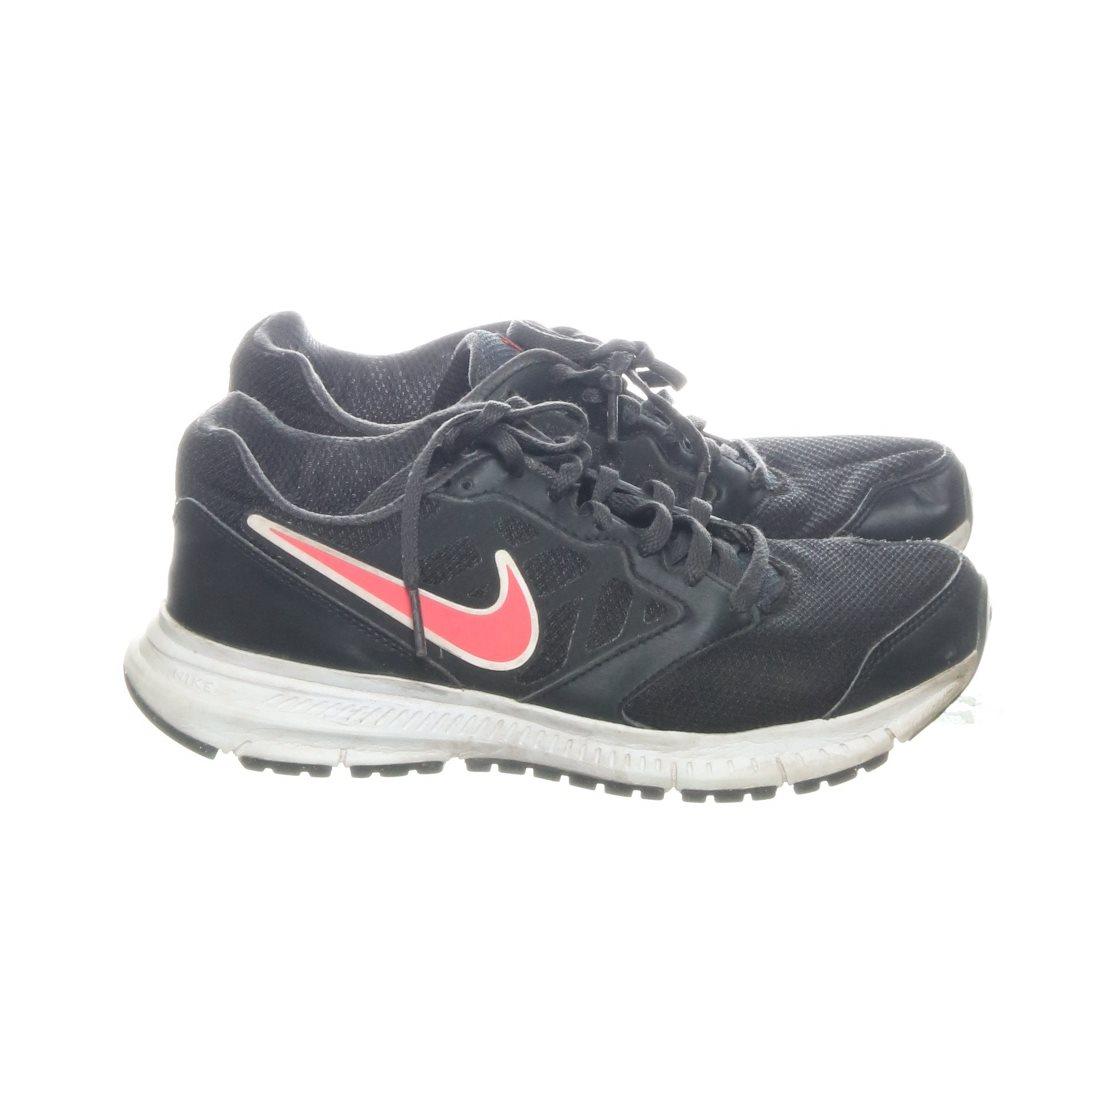 sports shoes 110ac 8ed42 nike run svart downshifter